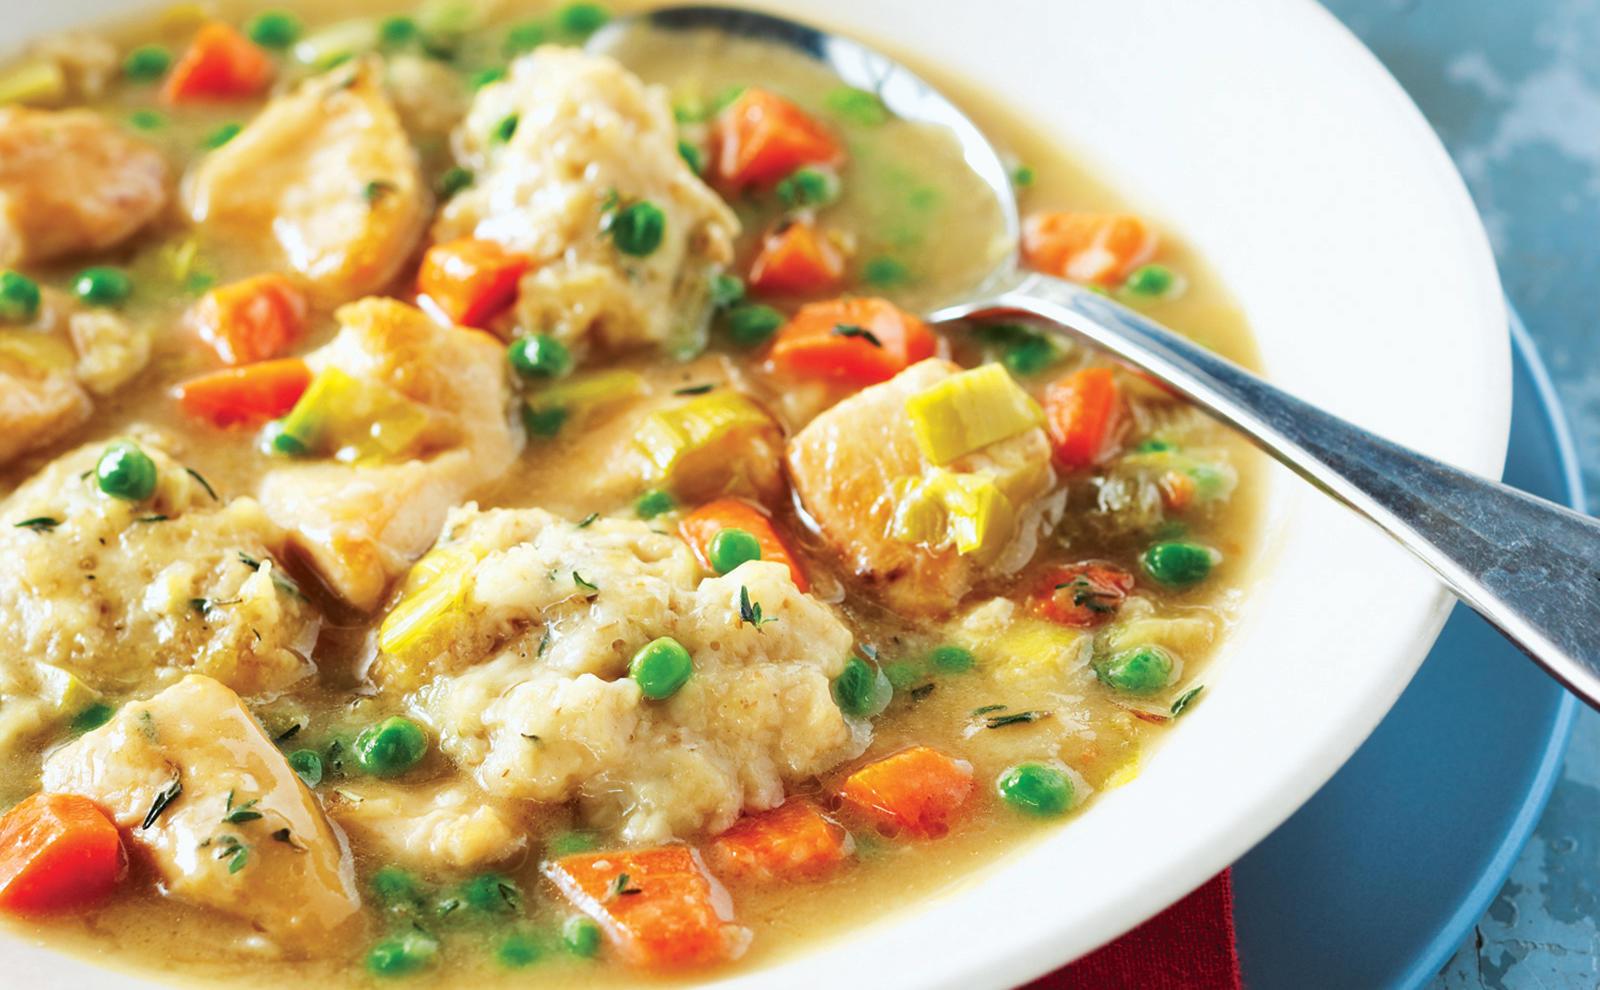 Simple Chicken Stew Recipe  Easy Chicken Stew Recipe Prepared For My Son Lin that